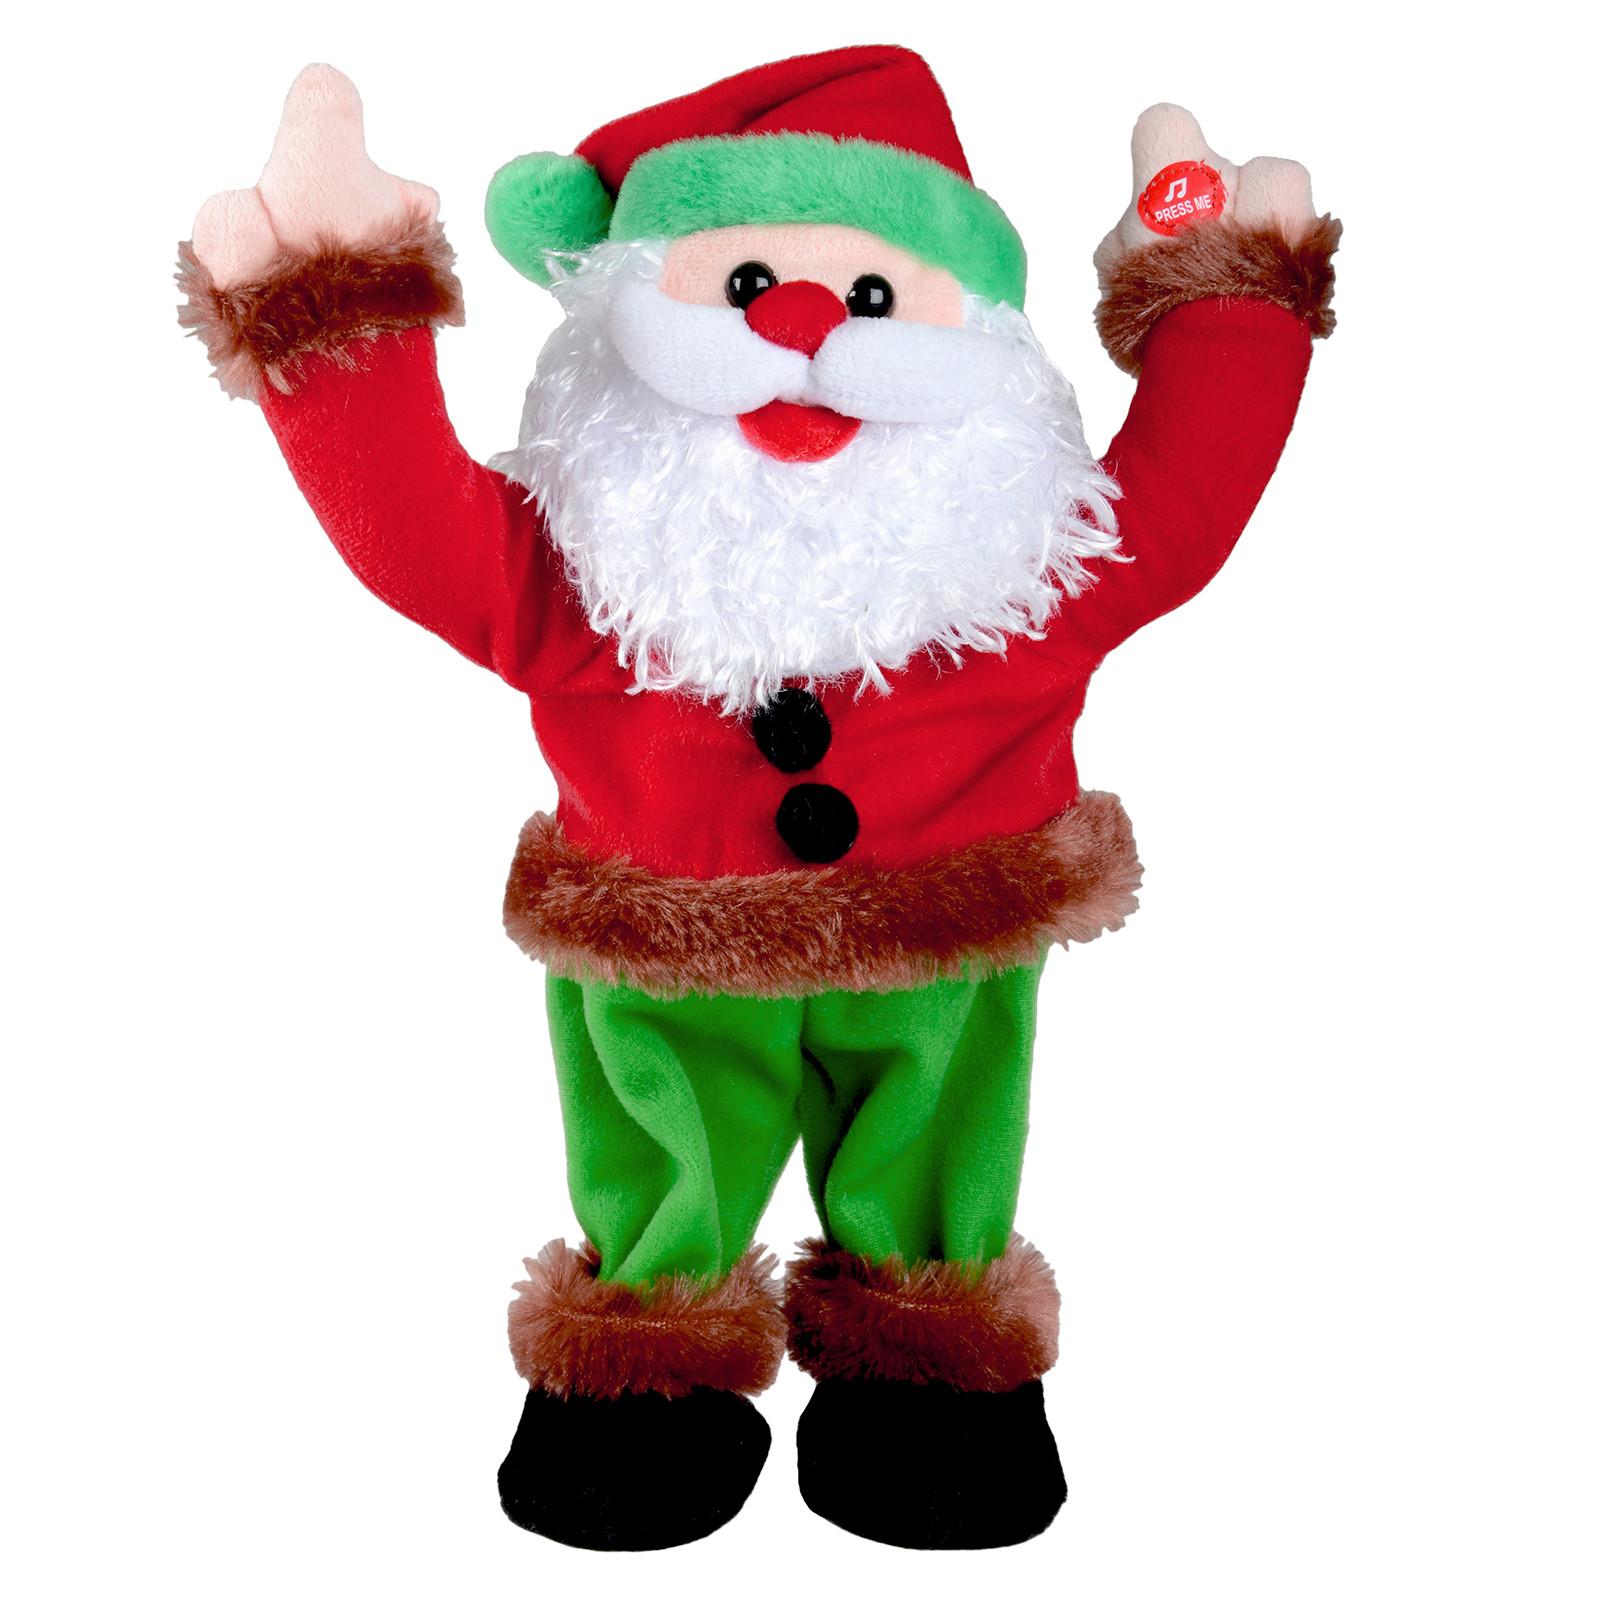 DIY Animated Christmas Decorations  Animated Musical Dancing Moving Christmas Xmas Decoration